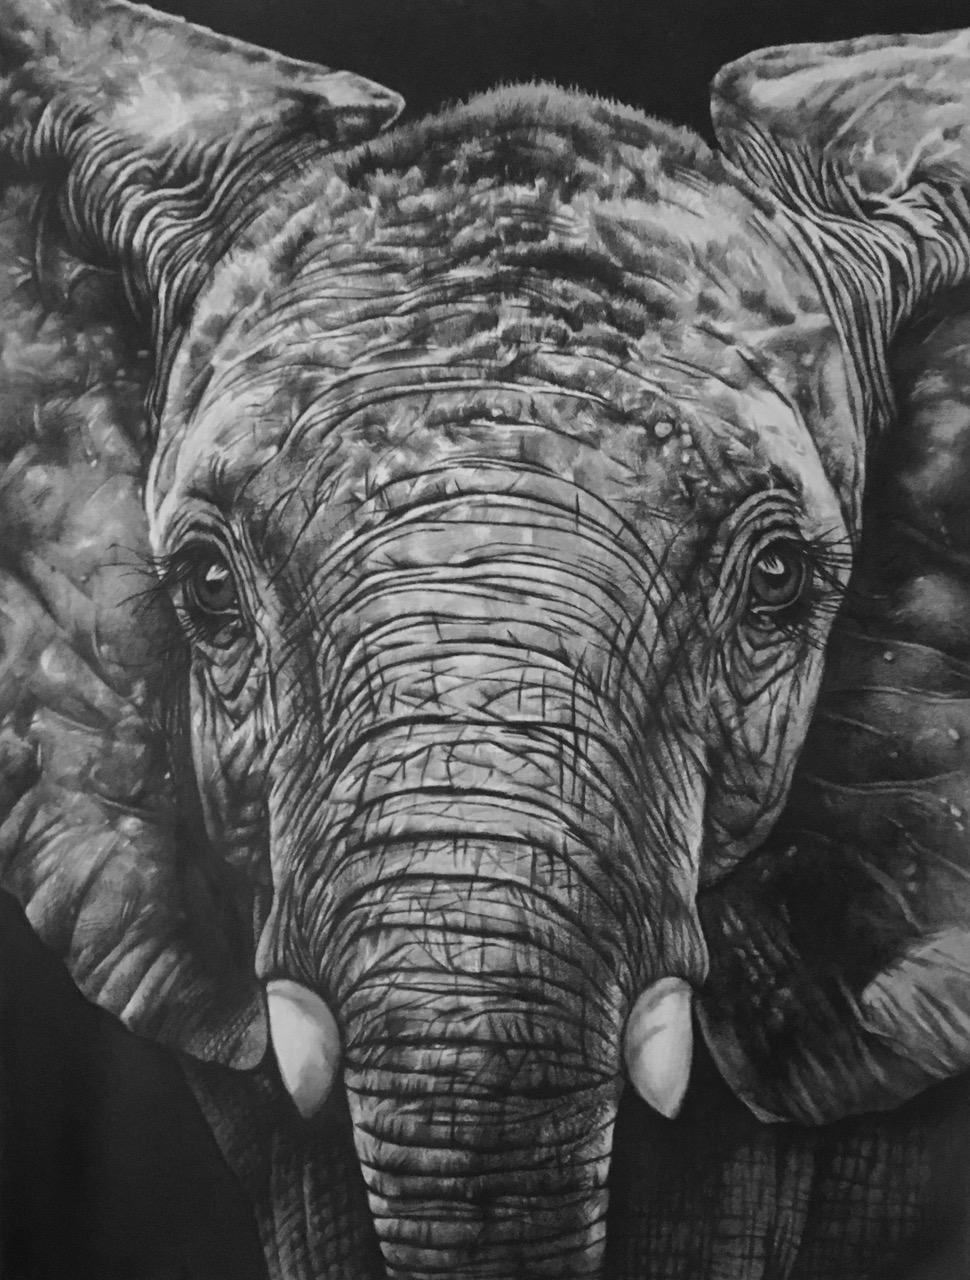 Wz 1077 - Mojo --- Bleistiftzeichnung auf Lwd | 145 x 110 cm, 2016